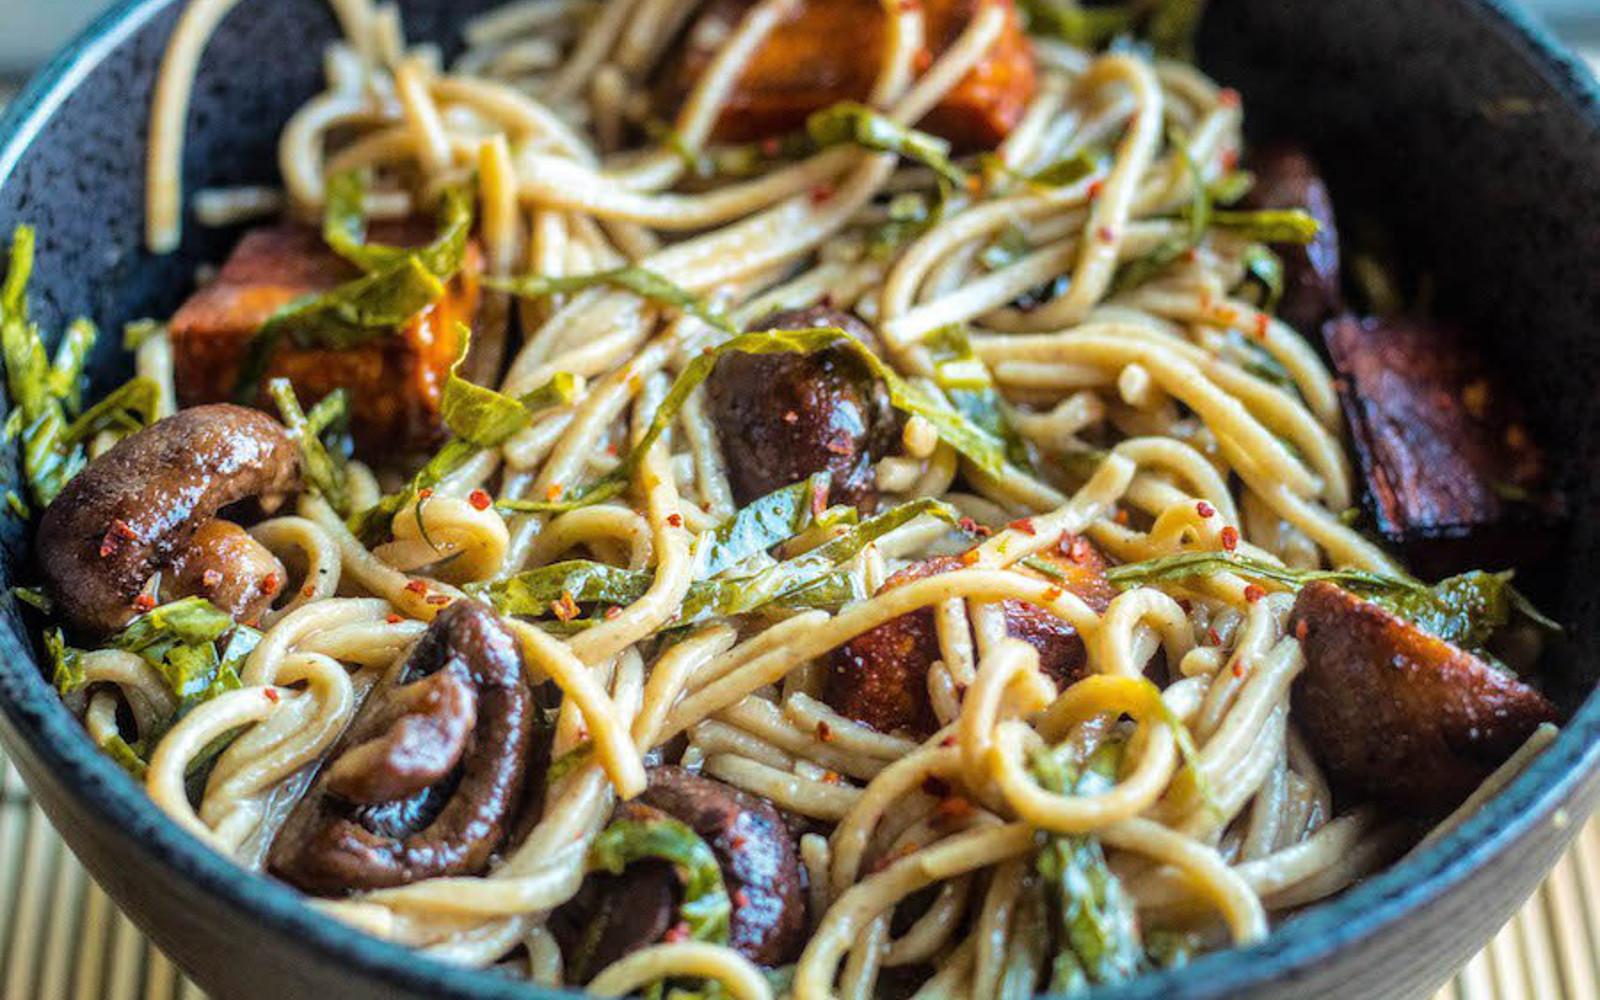 vegan stir-fried soba noodles with sweet potato and collard greens